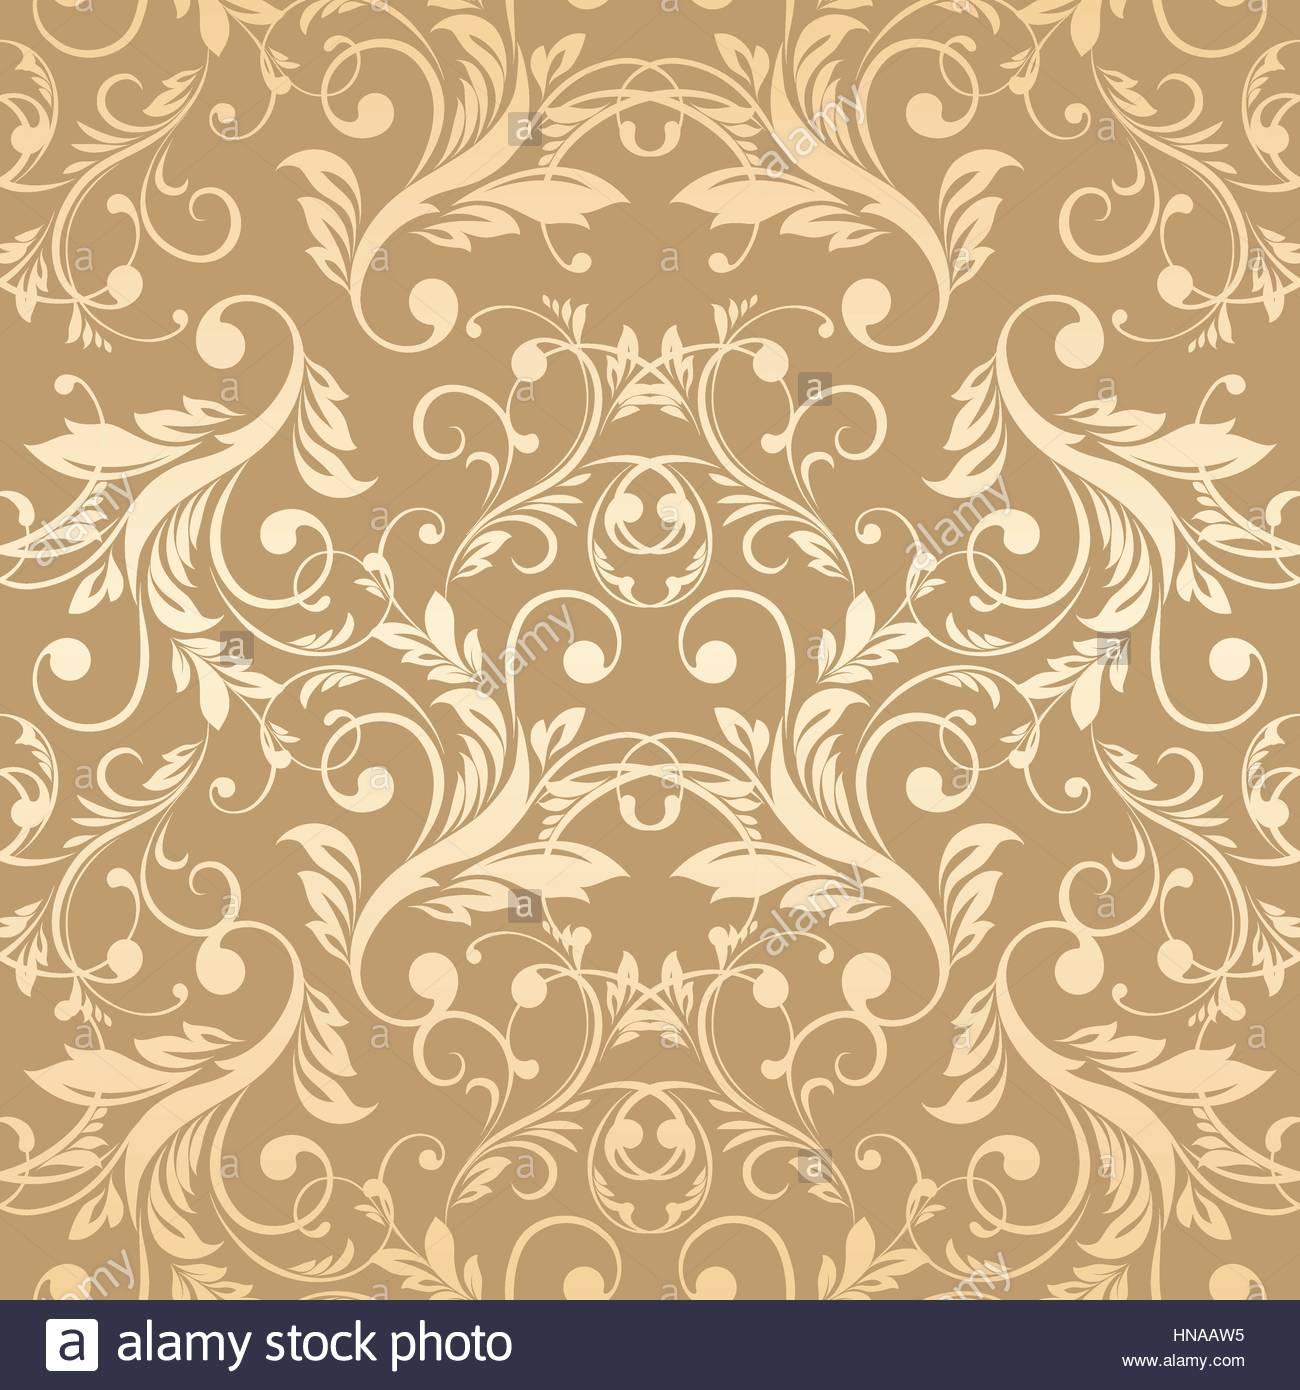 Luxury Golden Wallpaper Vintage Seamless Damask Pattern Vector Background